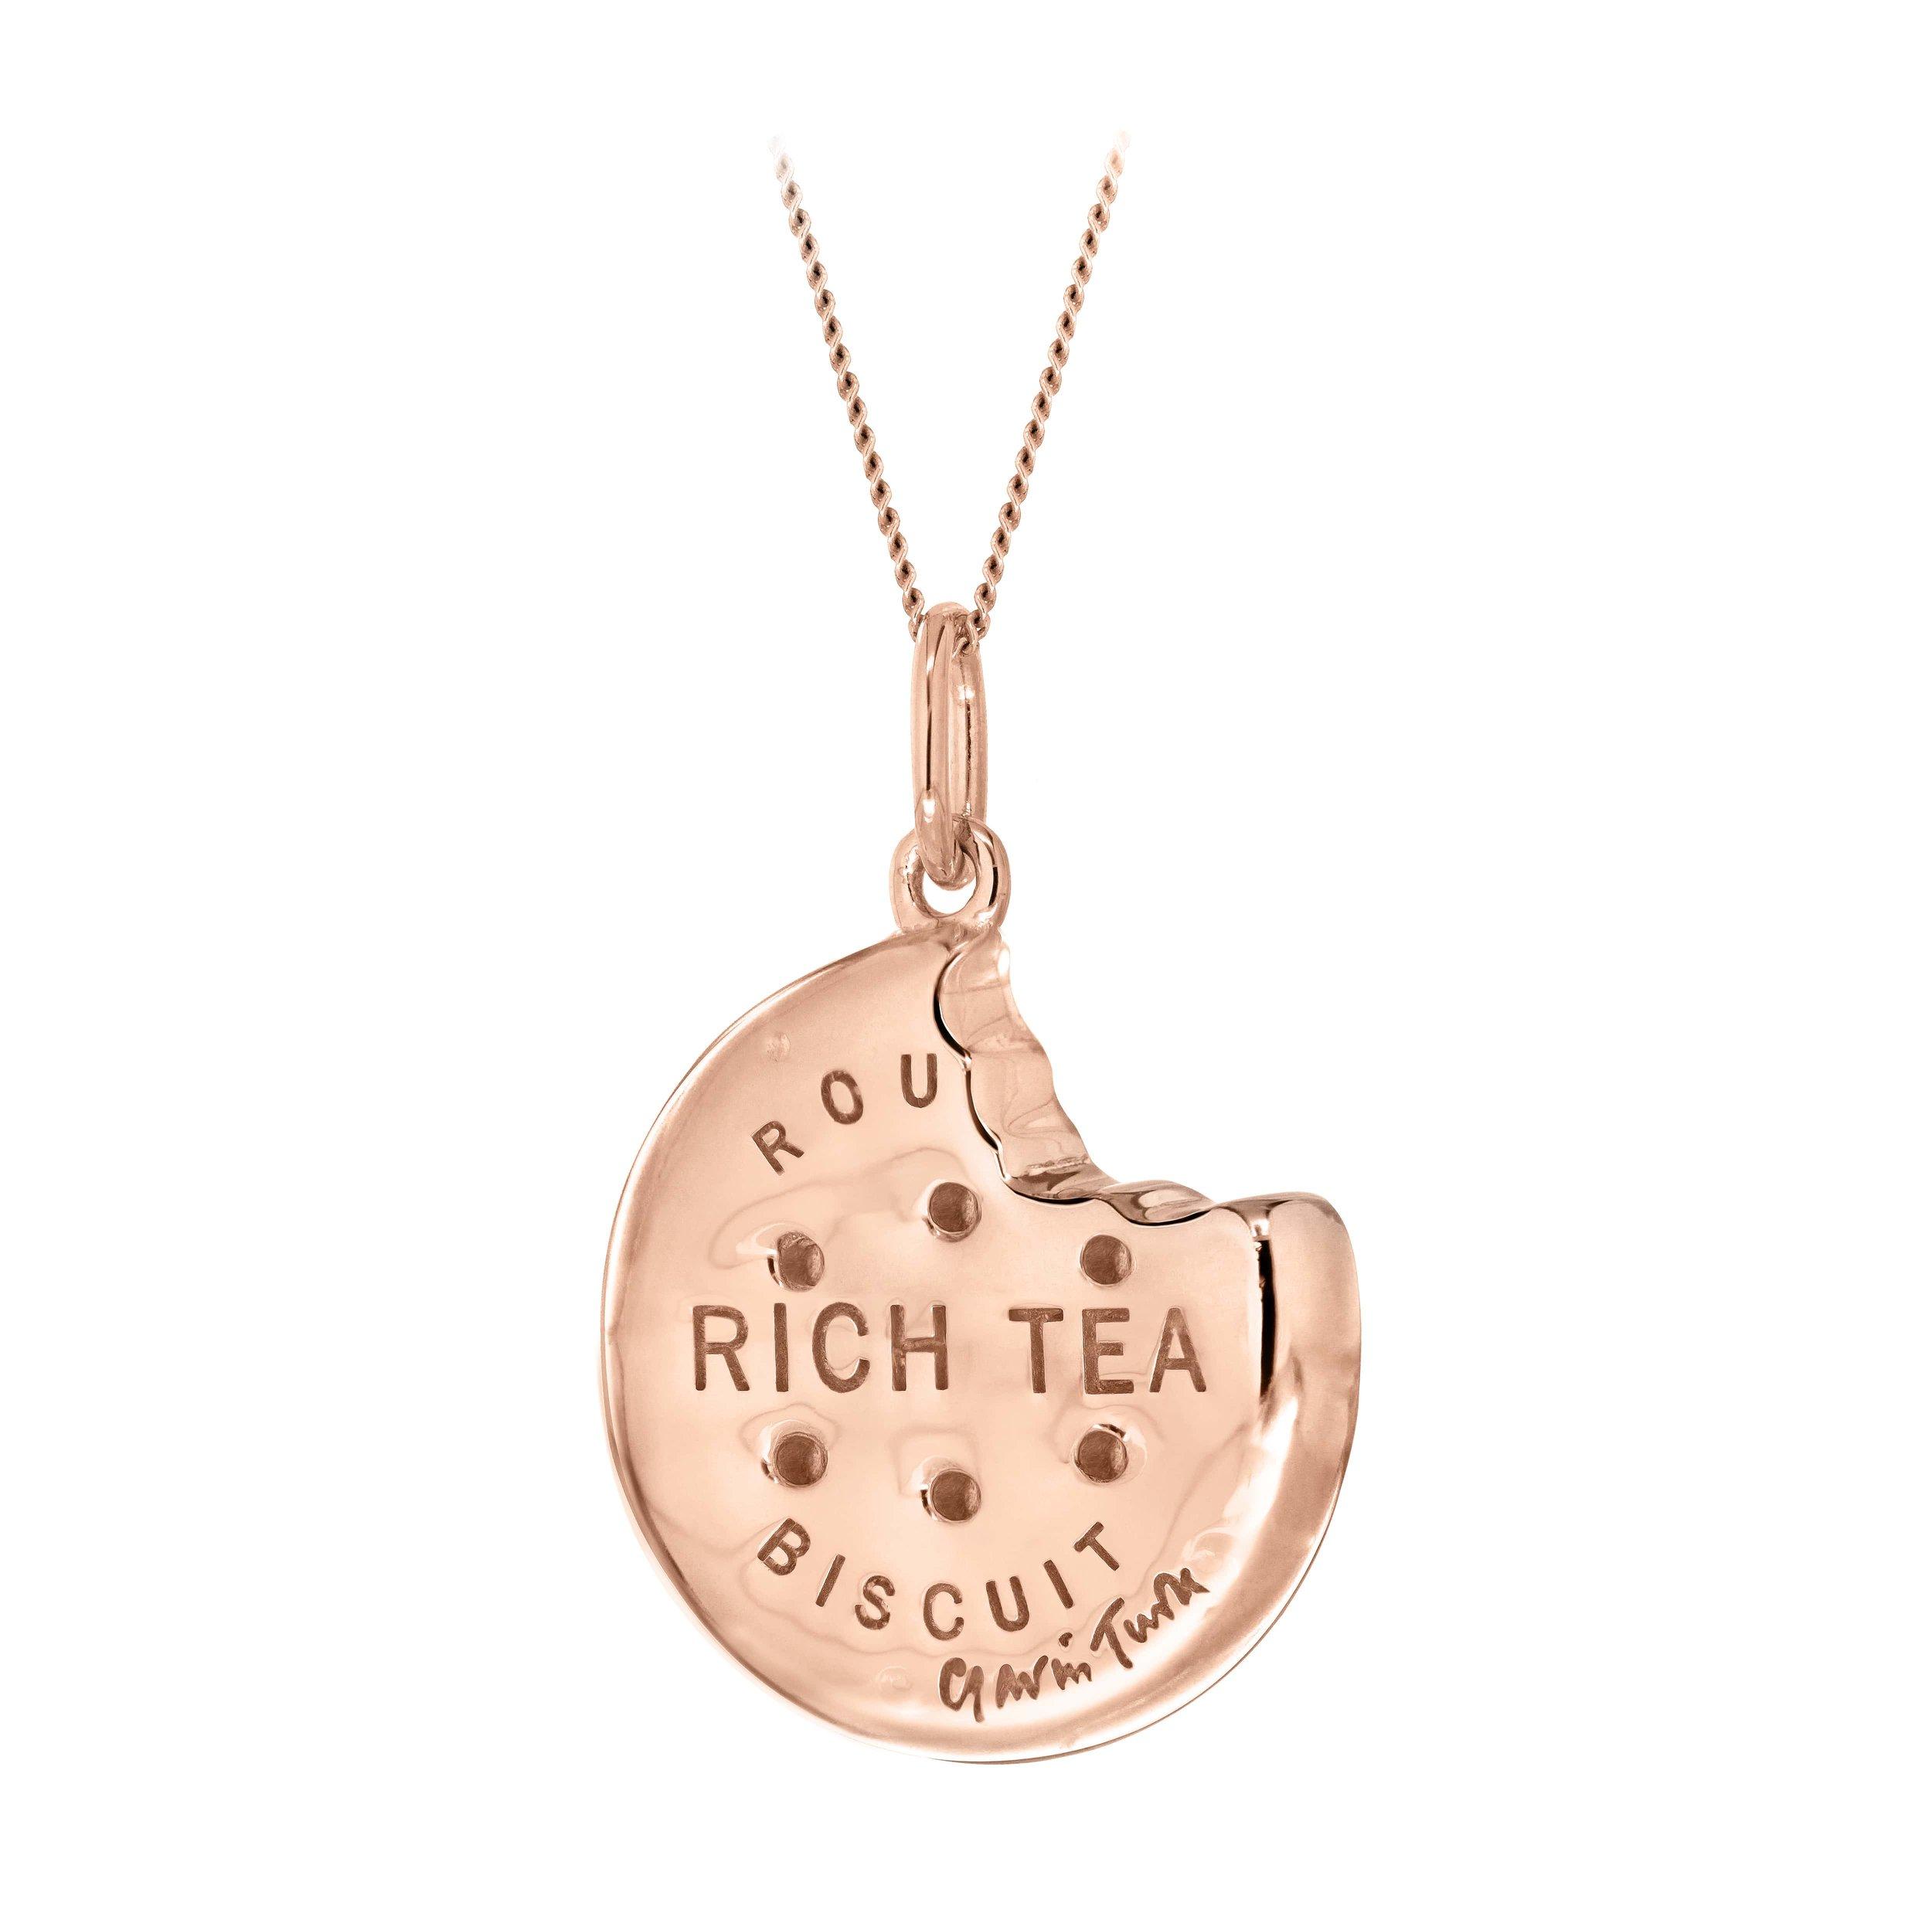 True Rocks Rich Tea chain